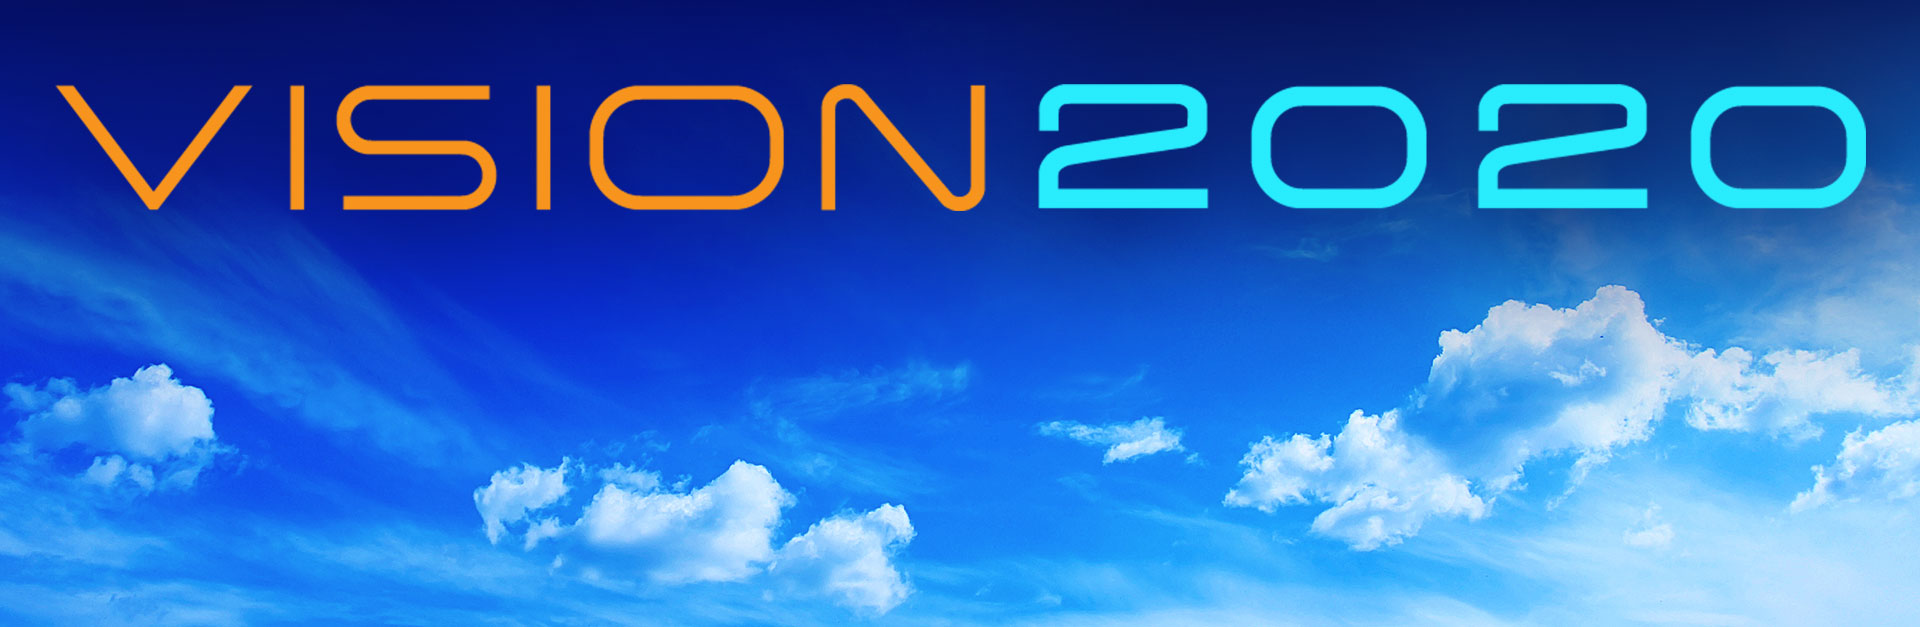 MLA_V2020_LogoOnly.jpg